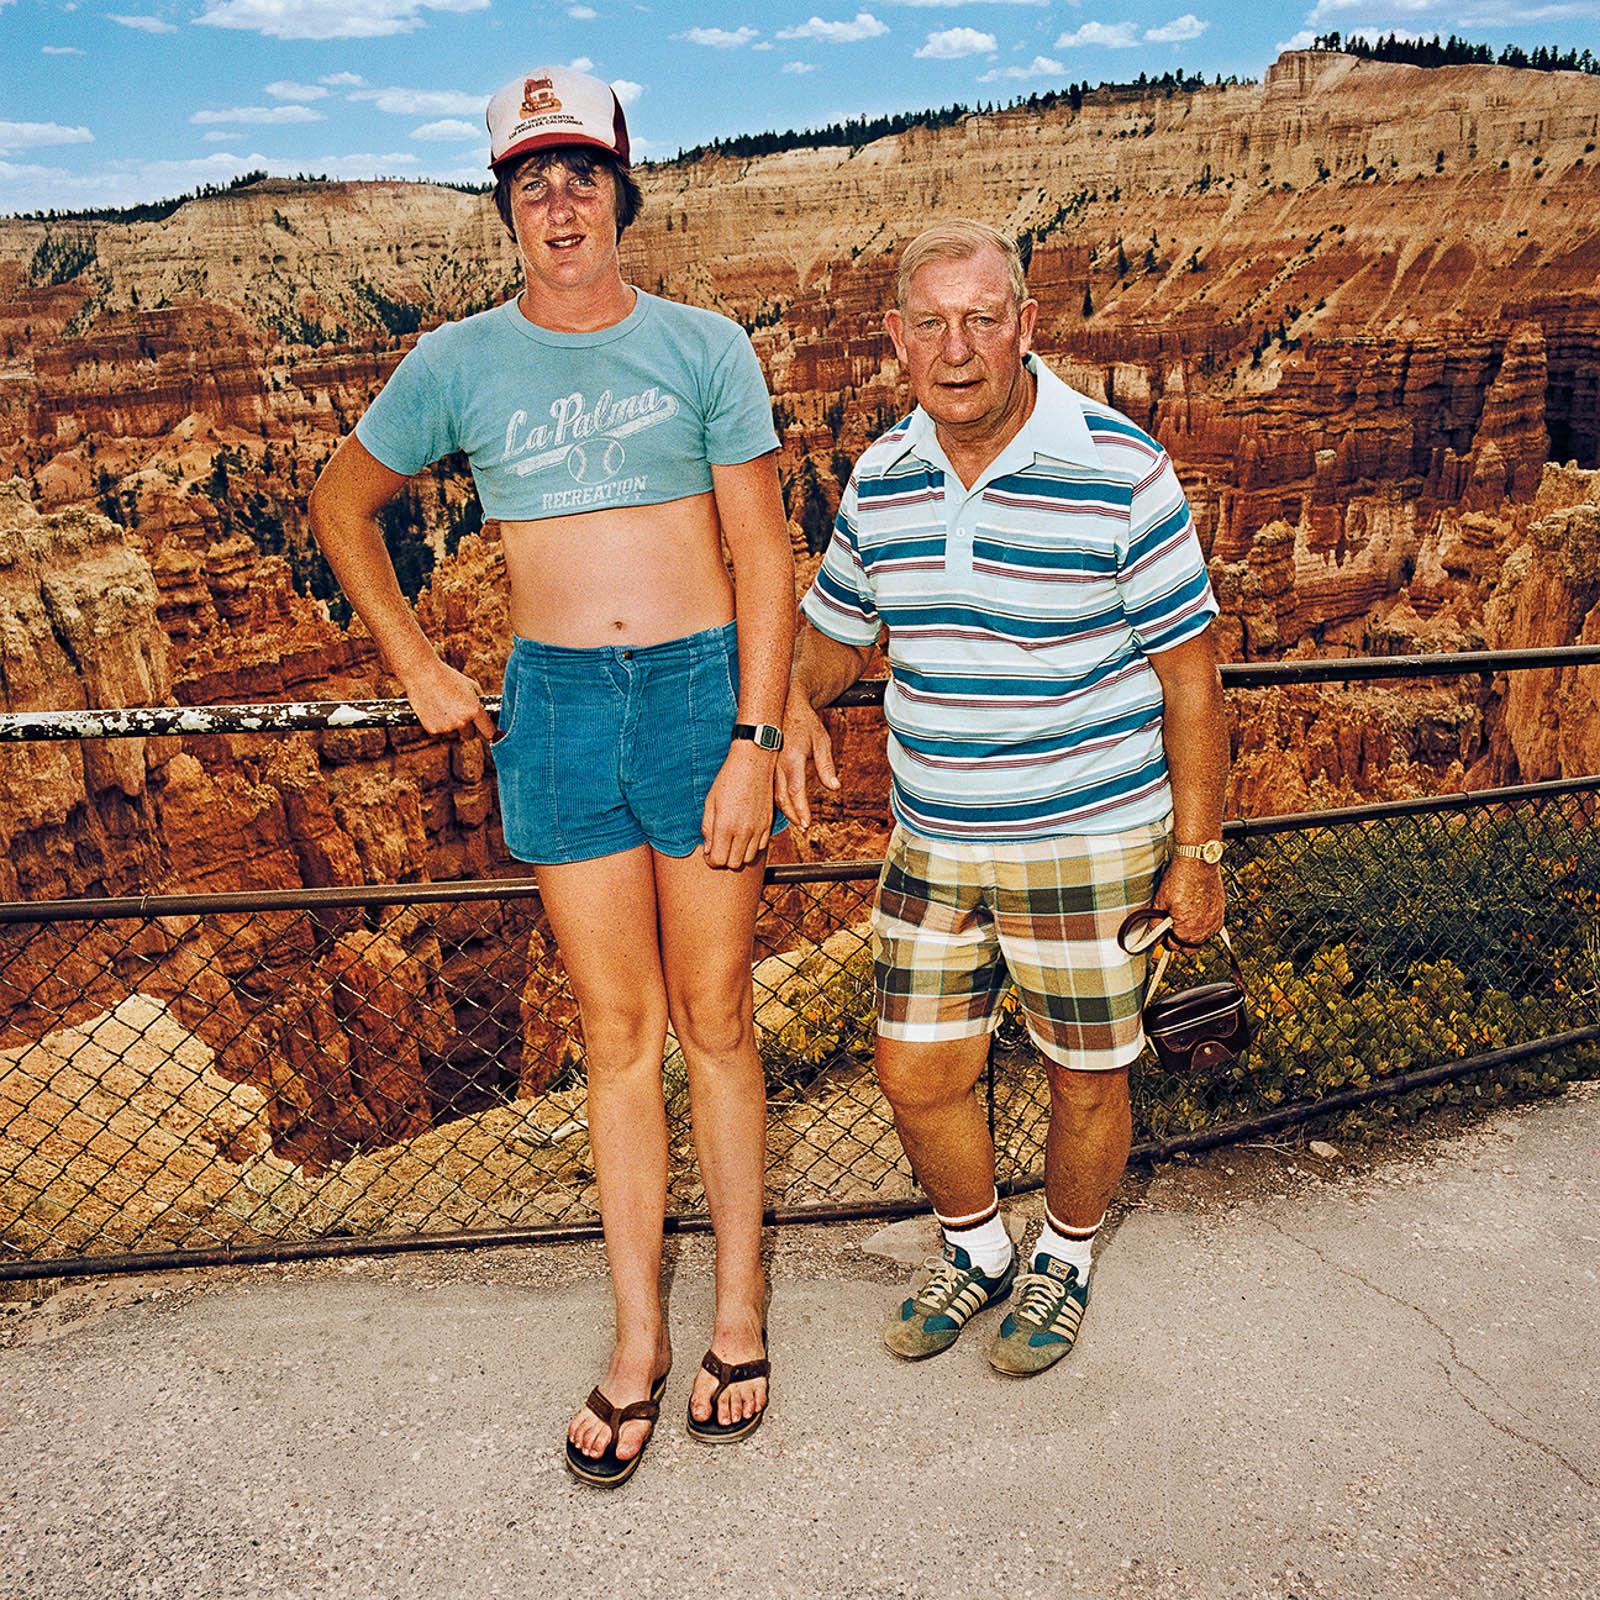 Uncle & Nephew at Bryce Canyon National Park, Utah 1981